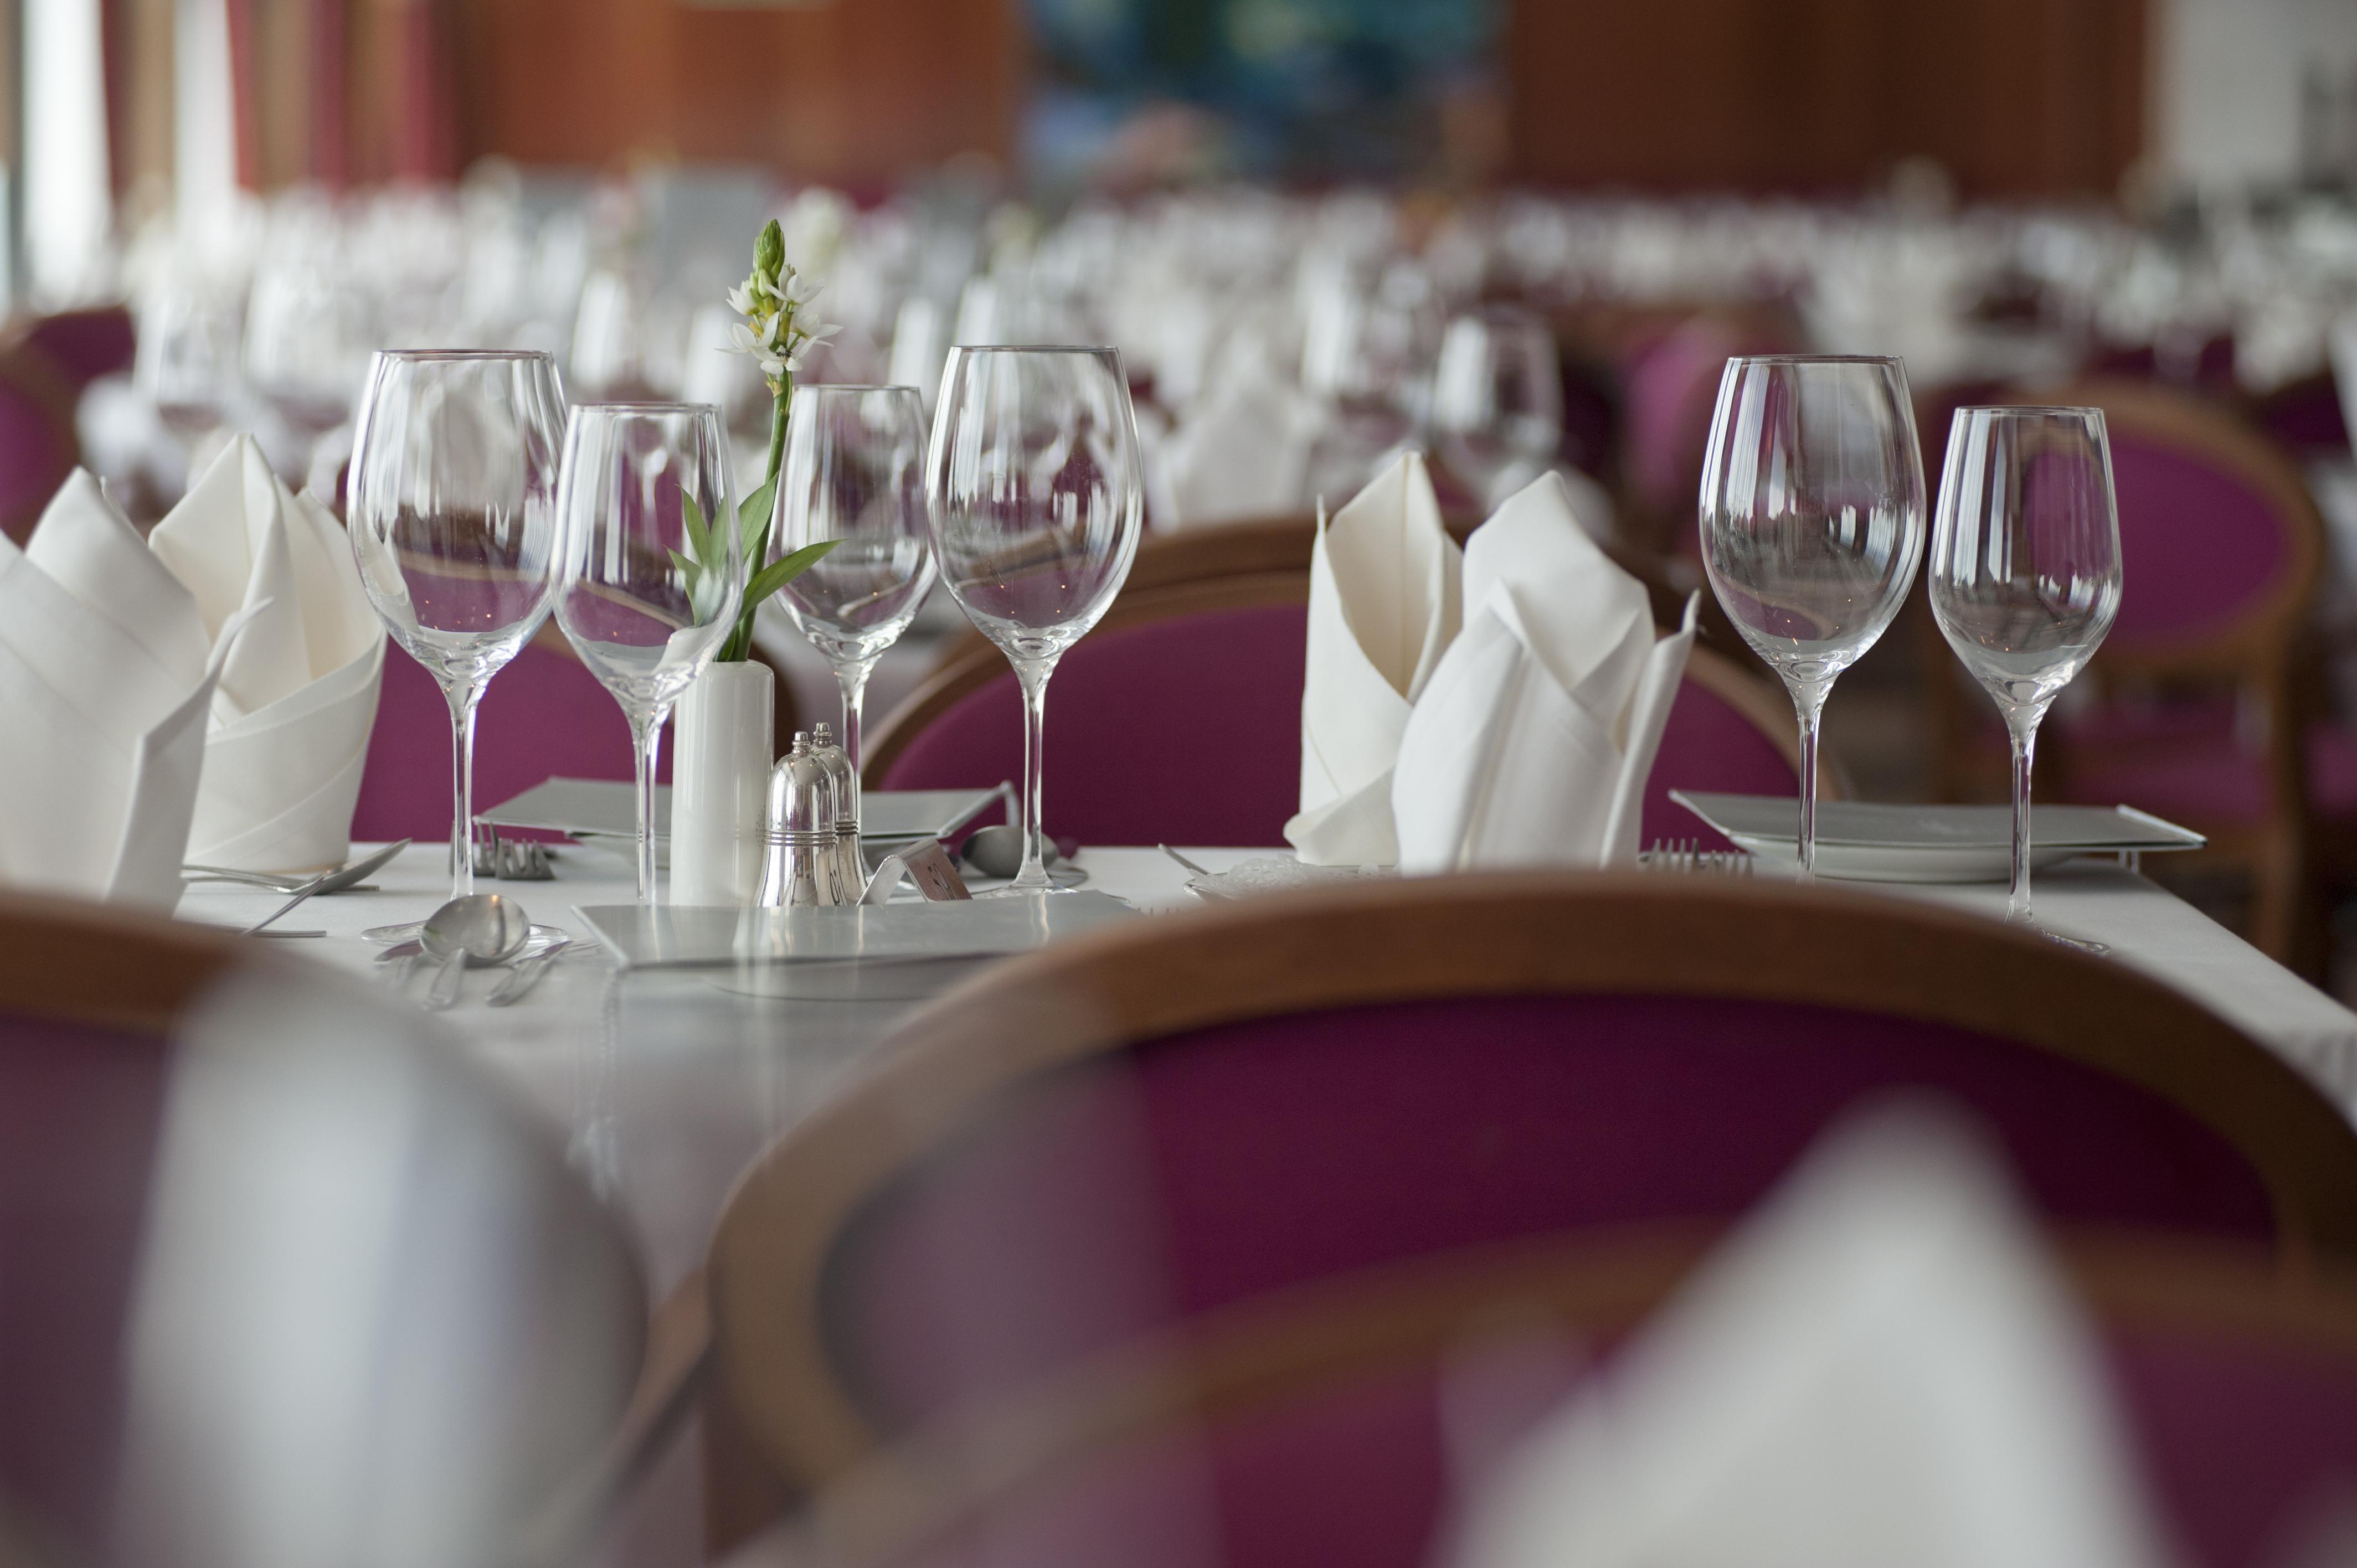 Fred Olsen Cruise Lines Boudicca Interior Tintagel Restaurant 7.jpg